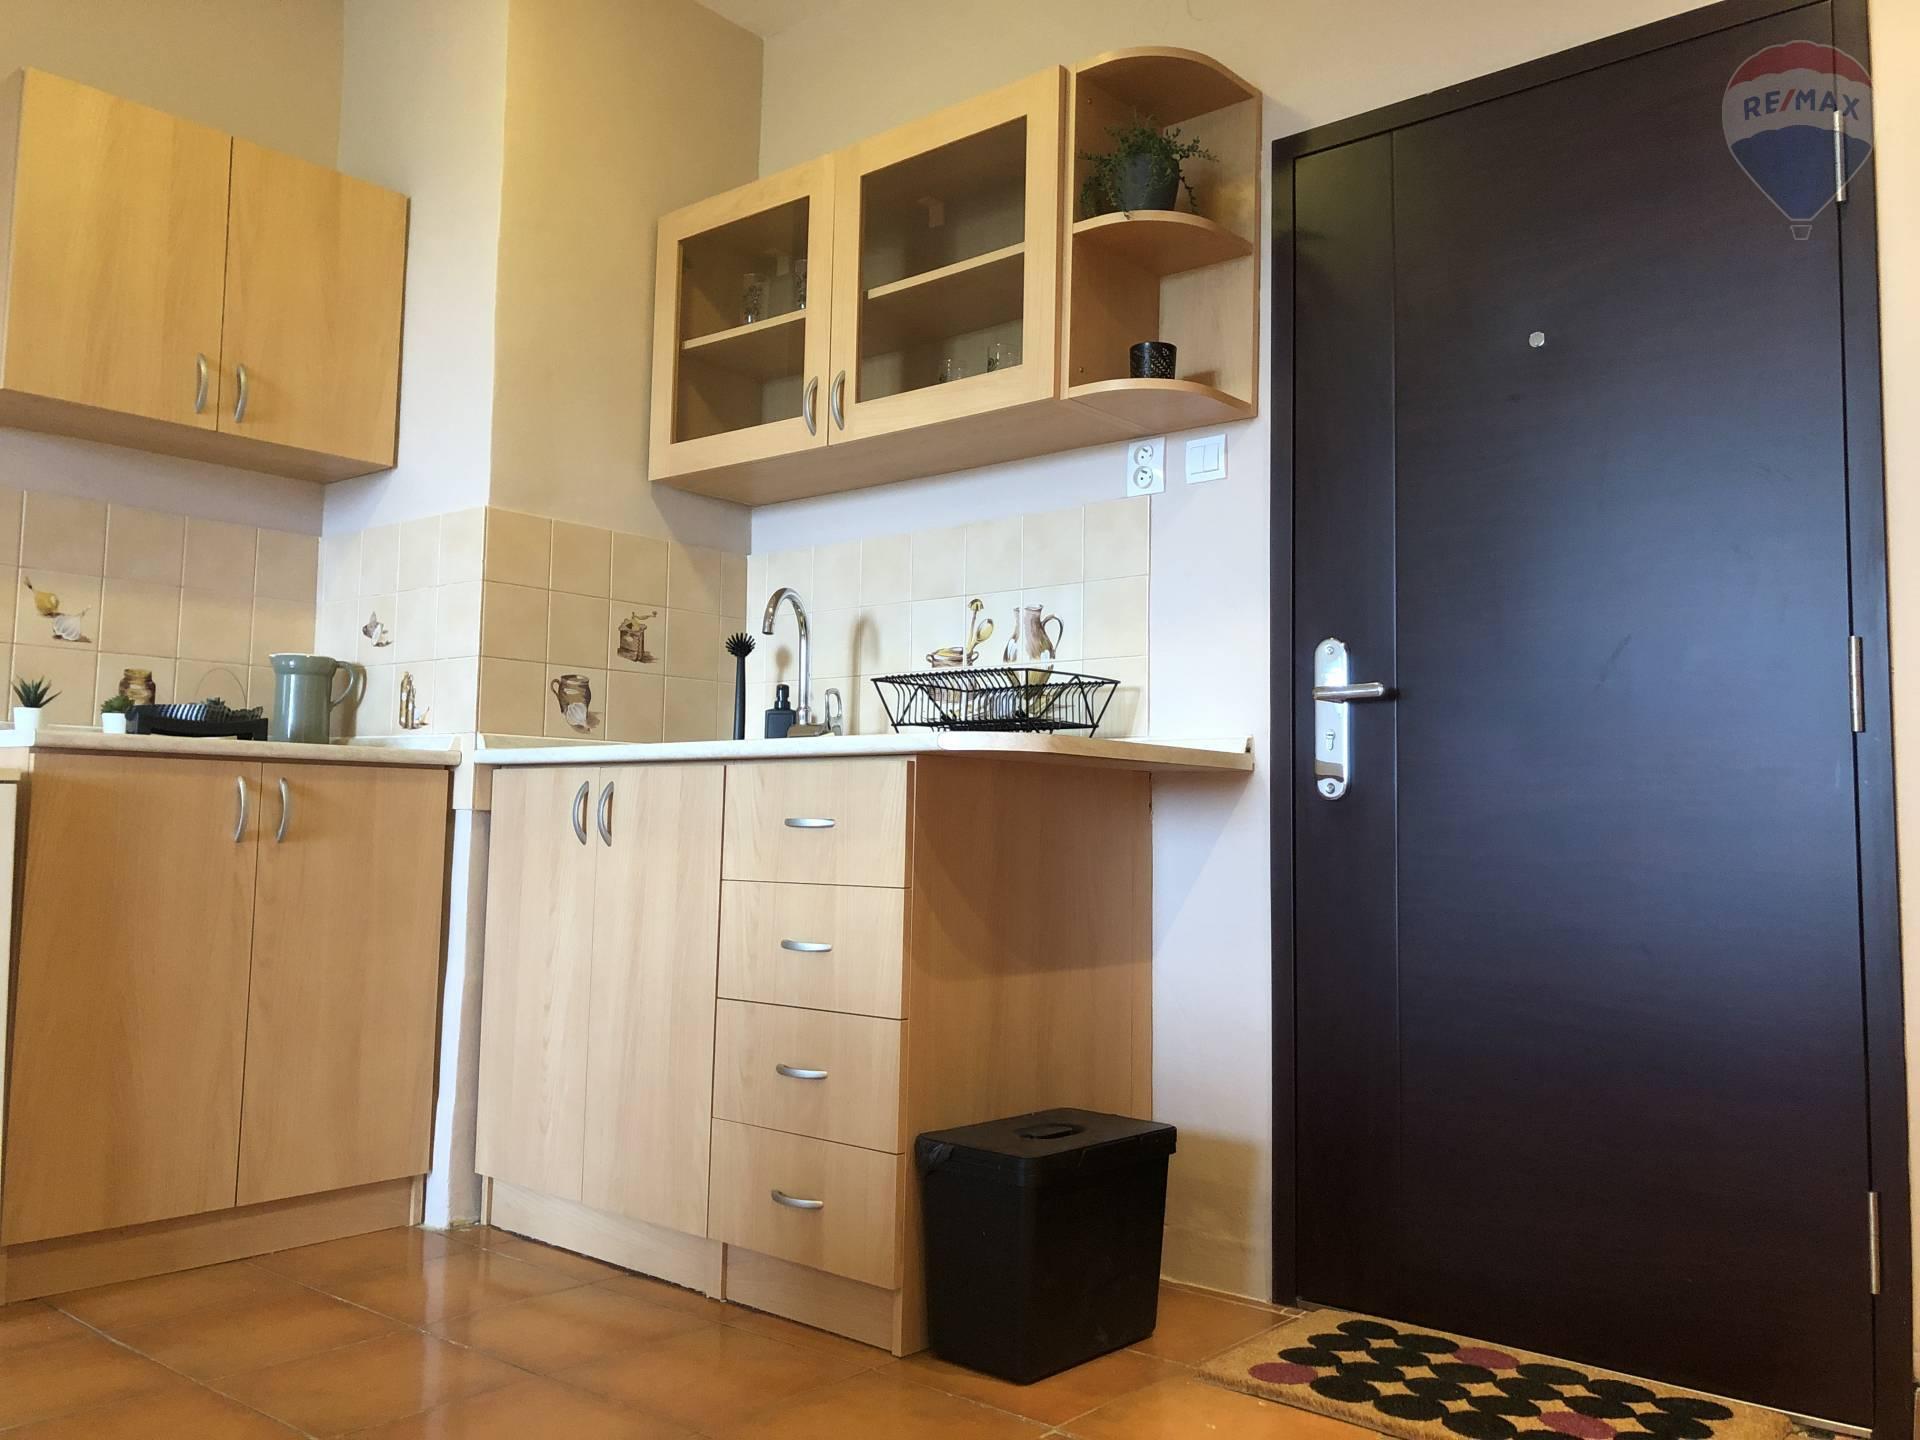 Predaj bytu (1 izbový) 40 m2, Bratislava - Vrakuňa - vstup + kuchyňa